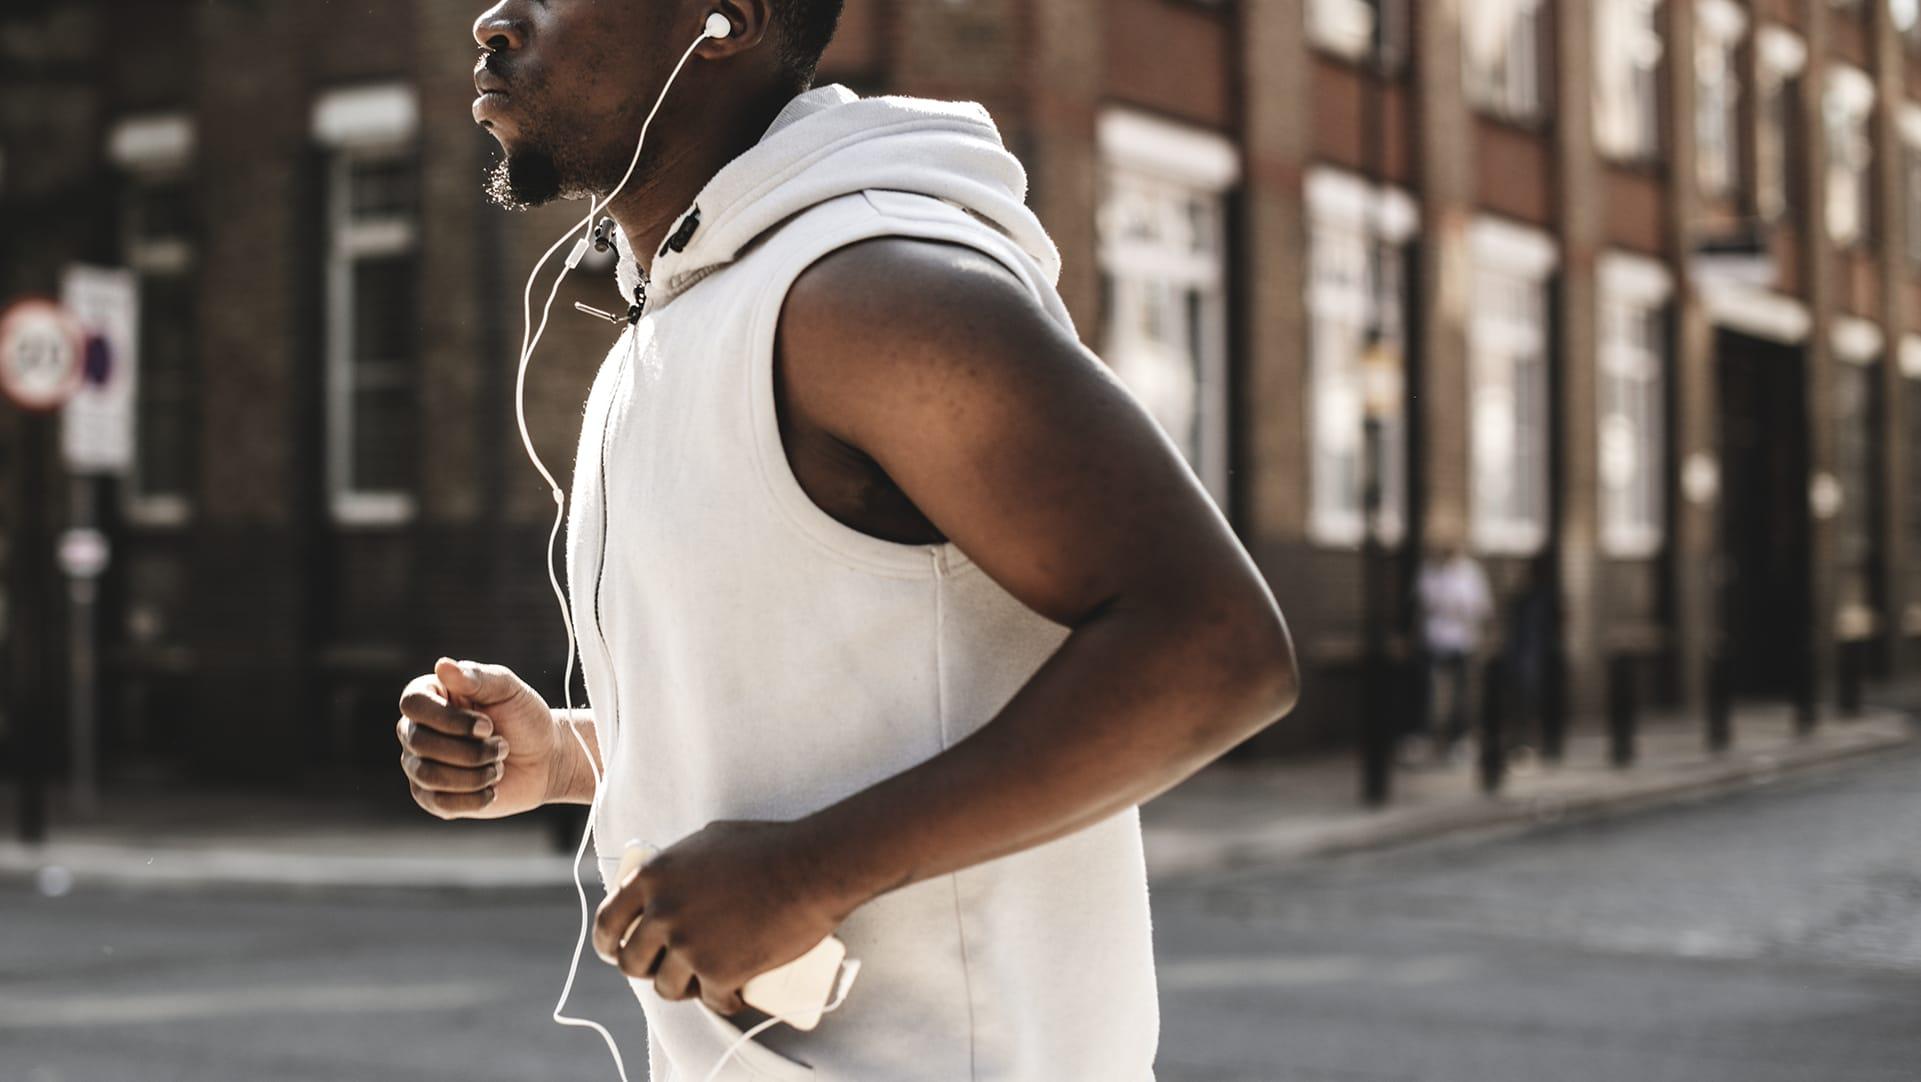 Man jogging through London listening to radio through headphones